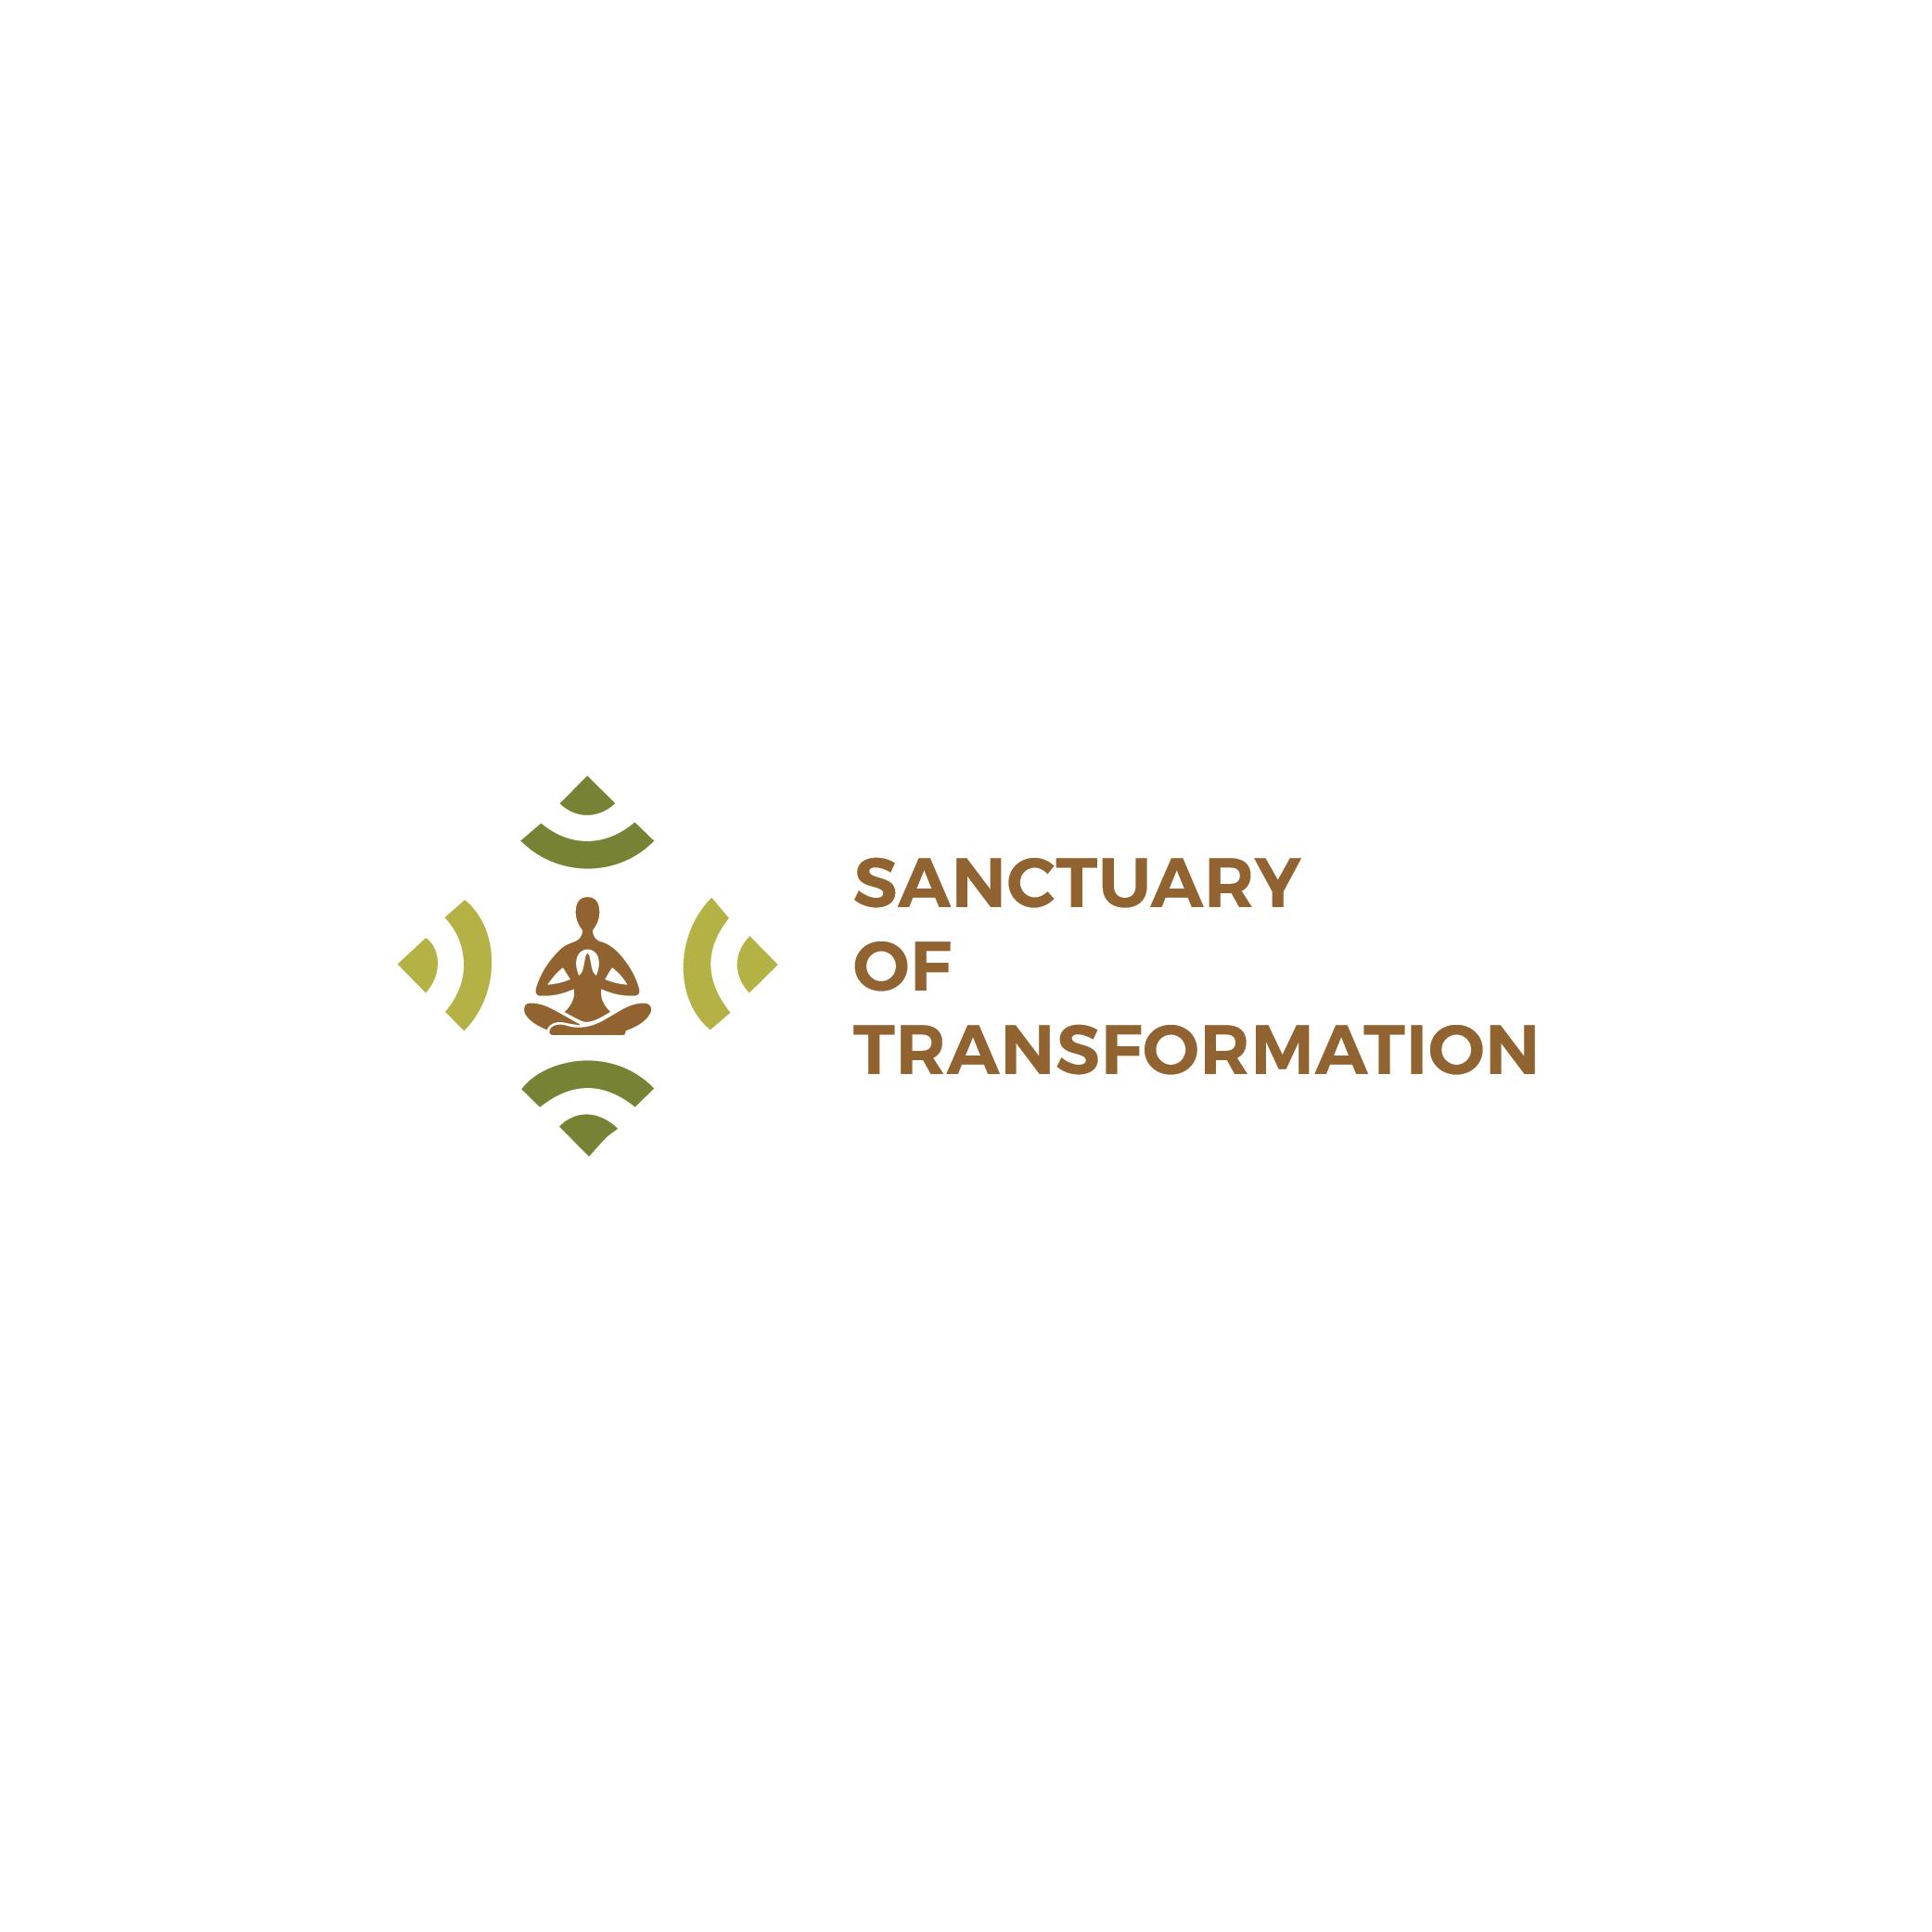 Logo Design by 354studio - Entry No. 37 in the Logo Design Contest Fun Logo Design for Sanctuary of Transformation.